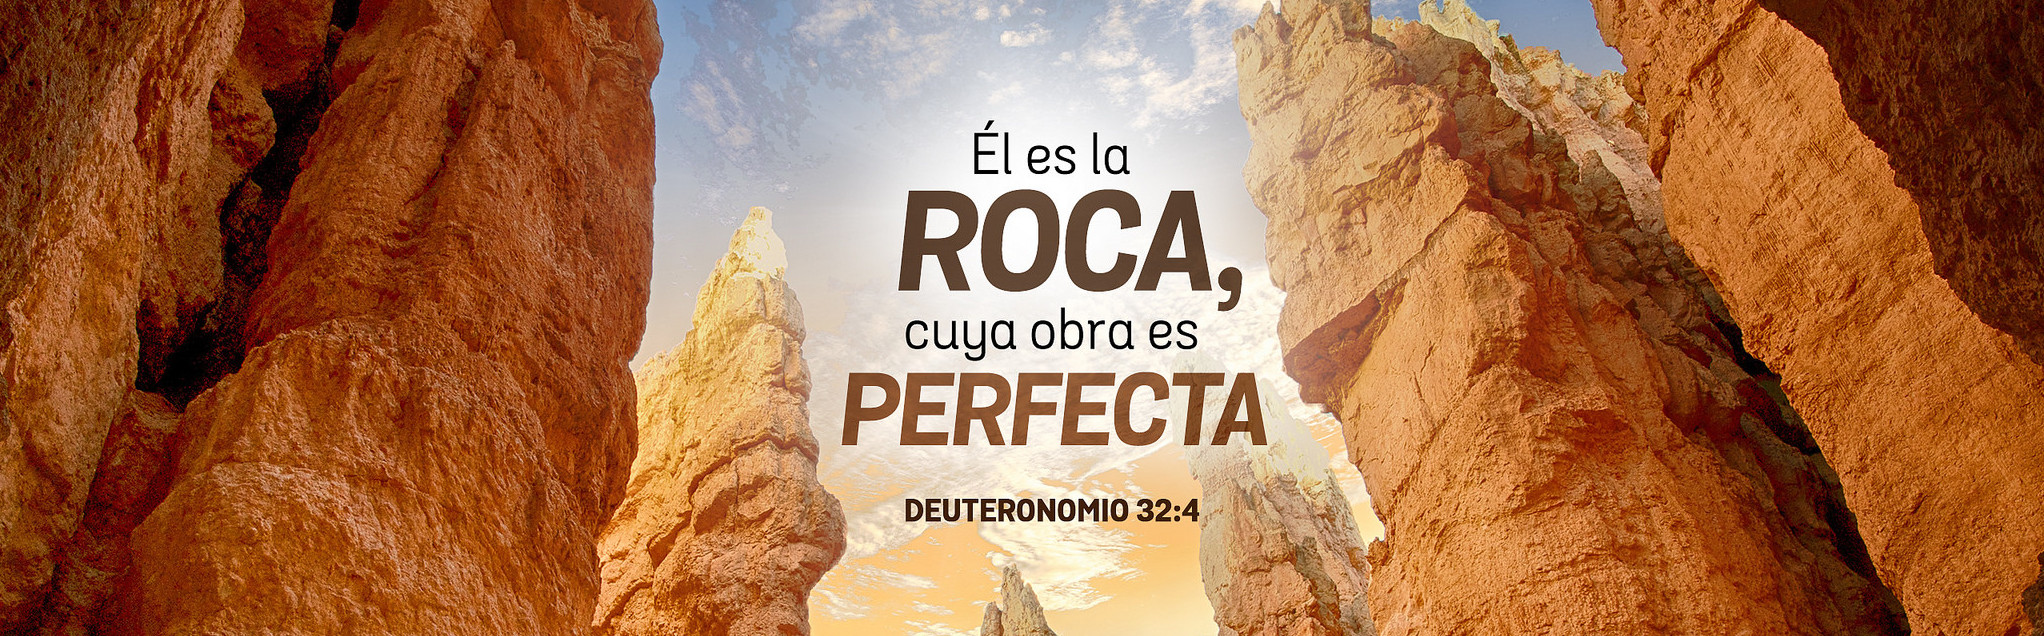 Roca02